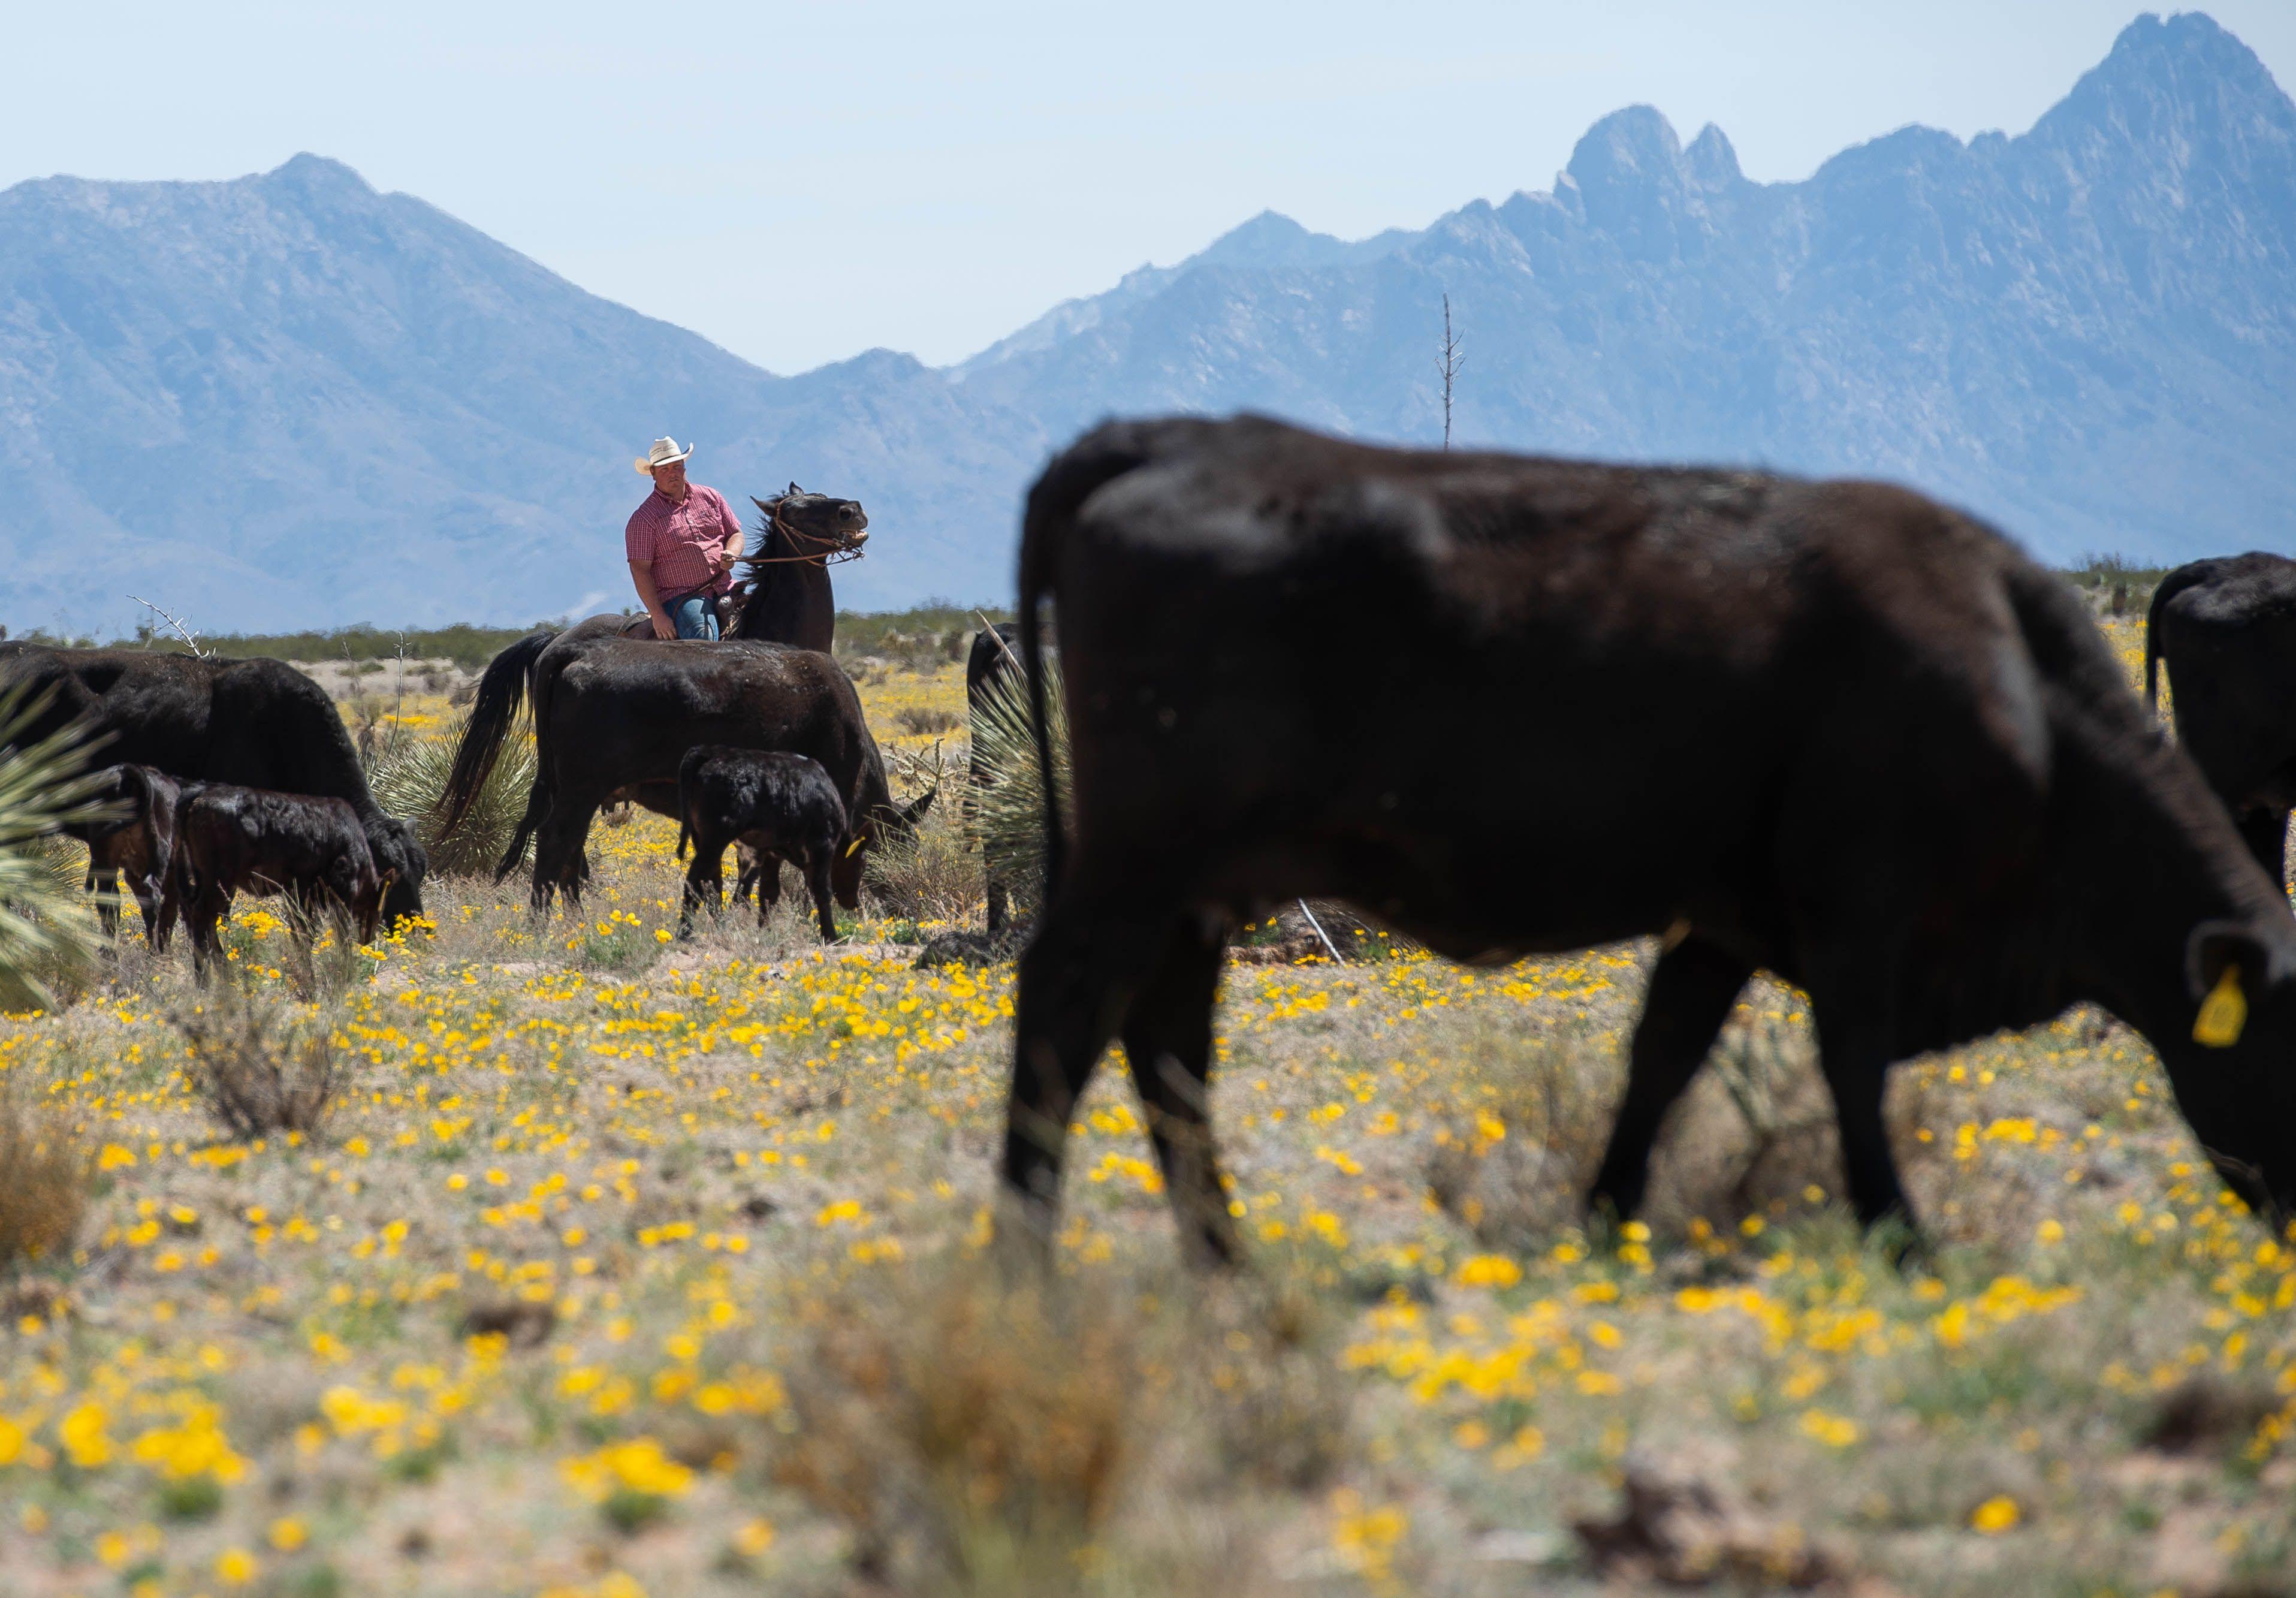 Soil Tests Provide A Scientific Basis For Regulating